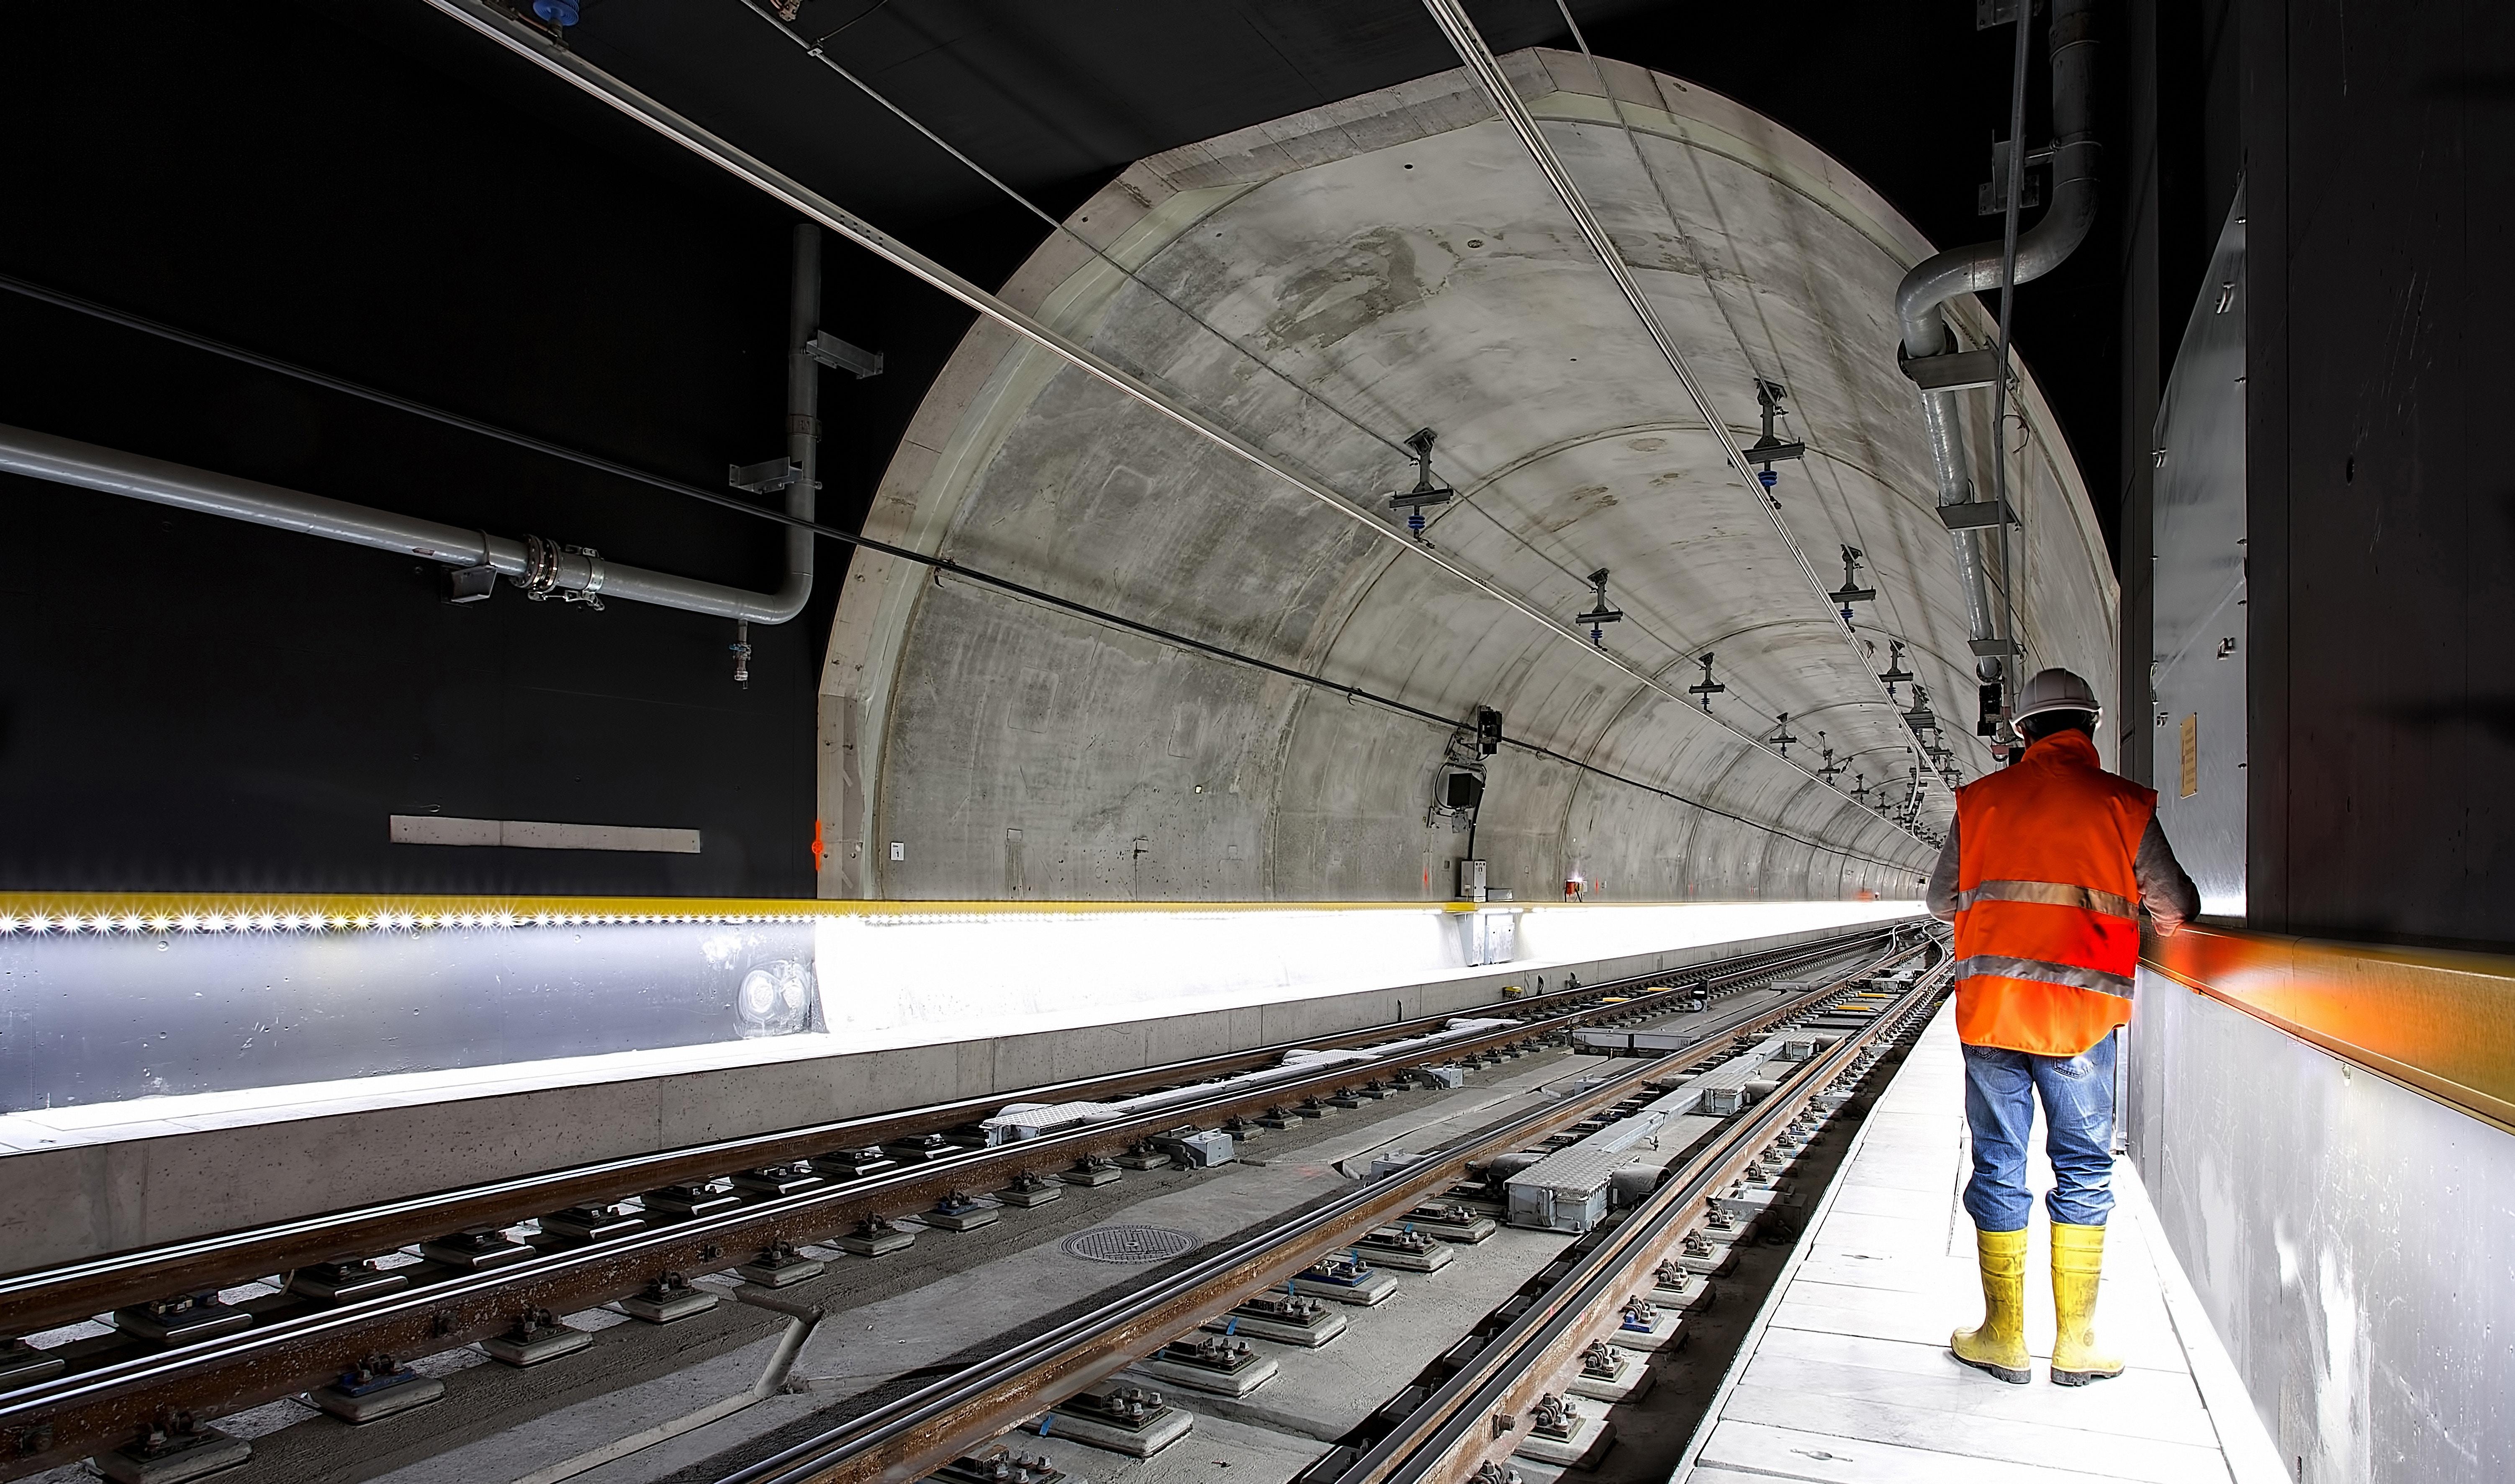 iot use in underground tunnels